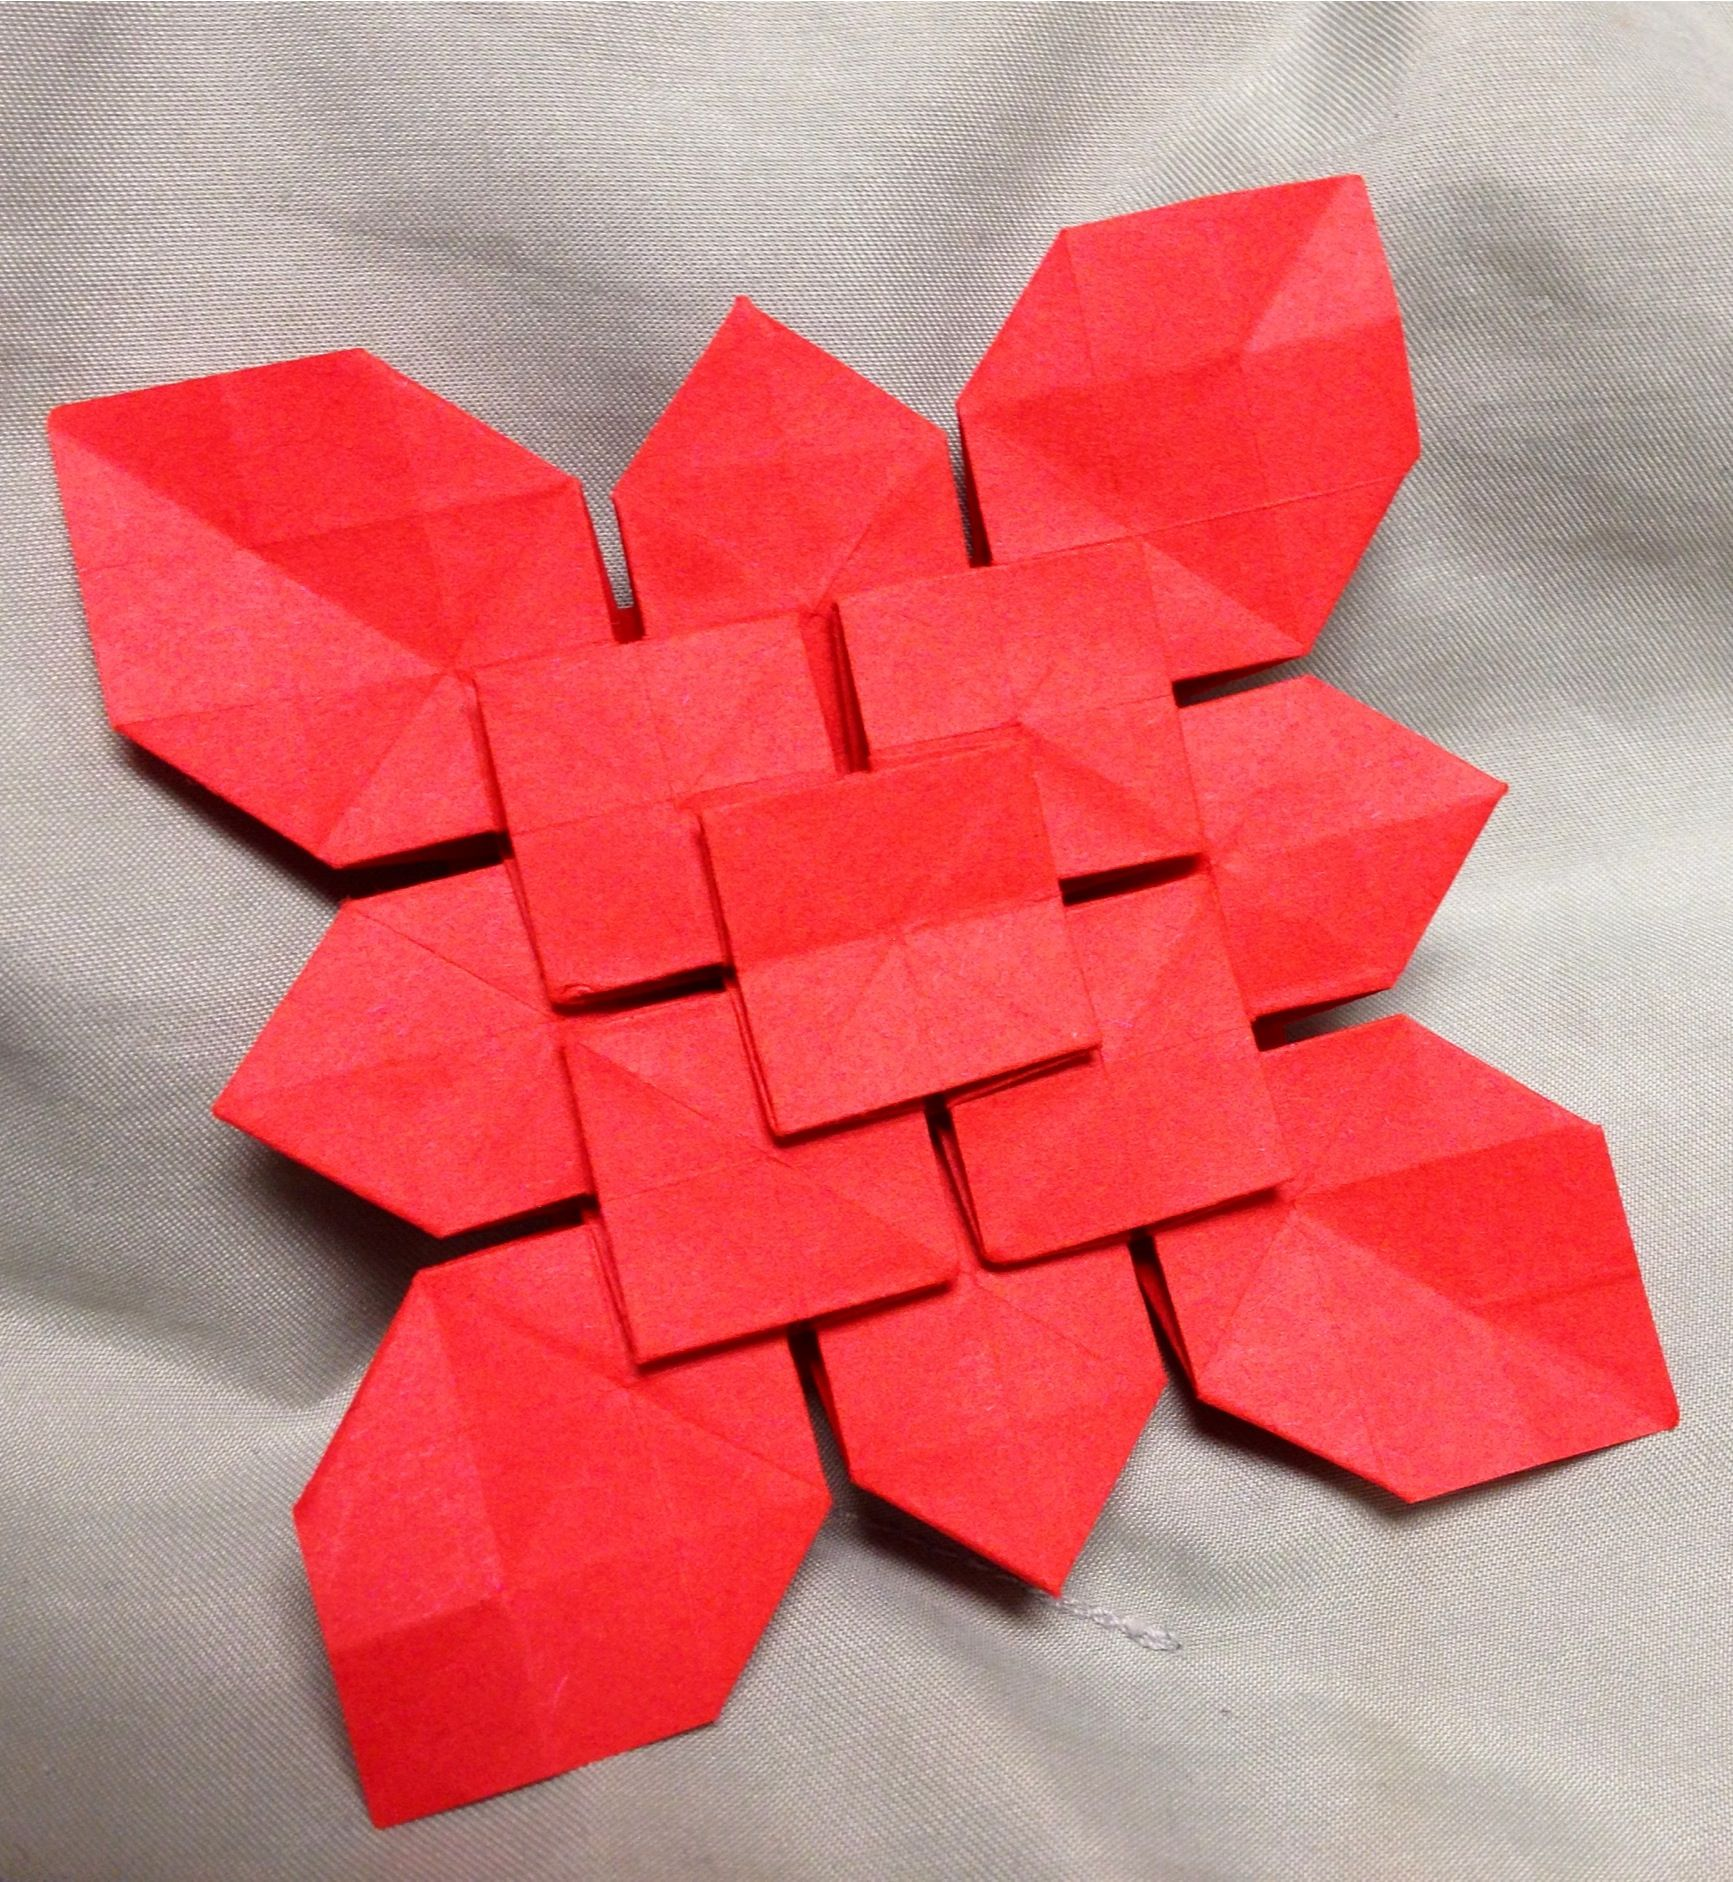 Origami Origami Paper Art Origami Design Kids Origami